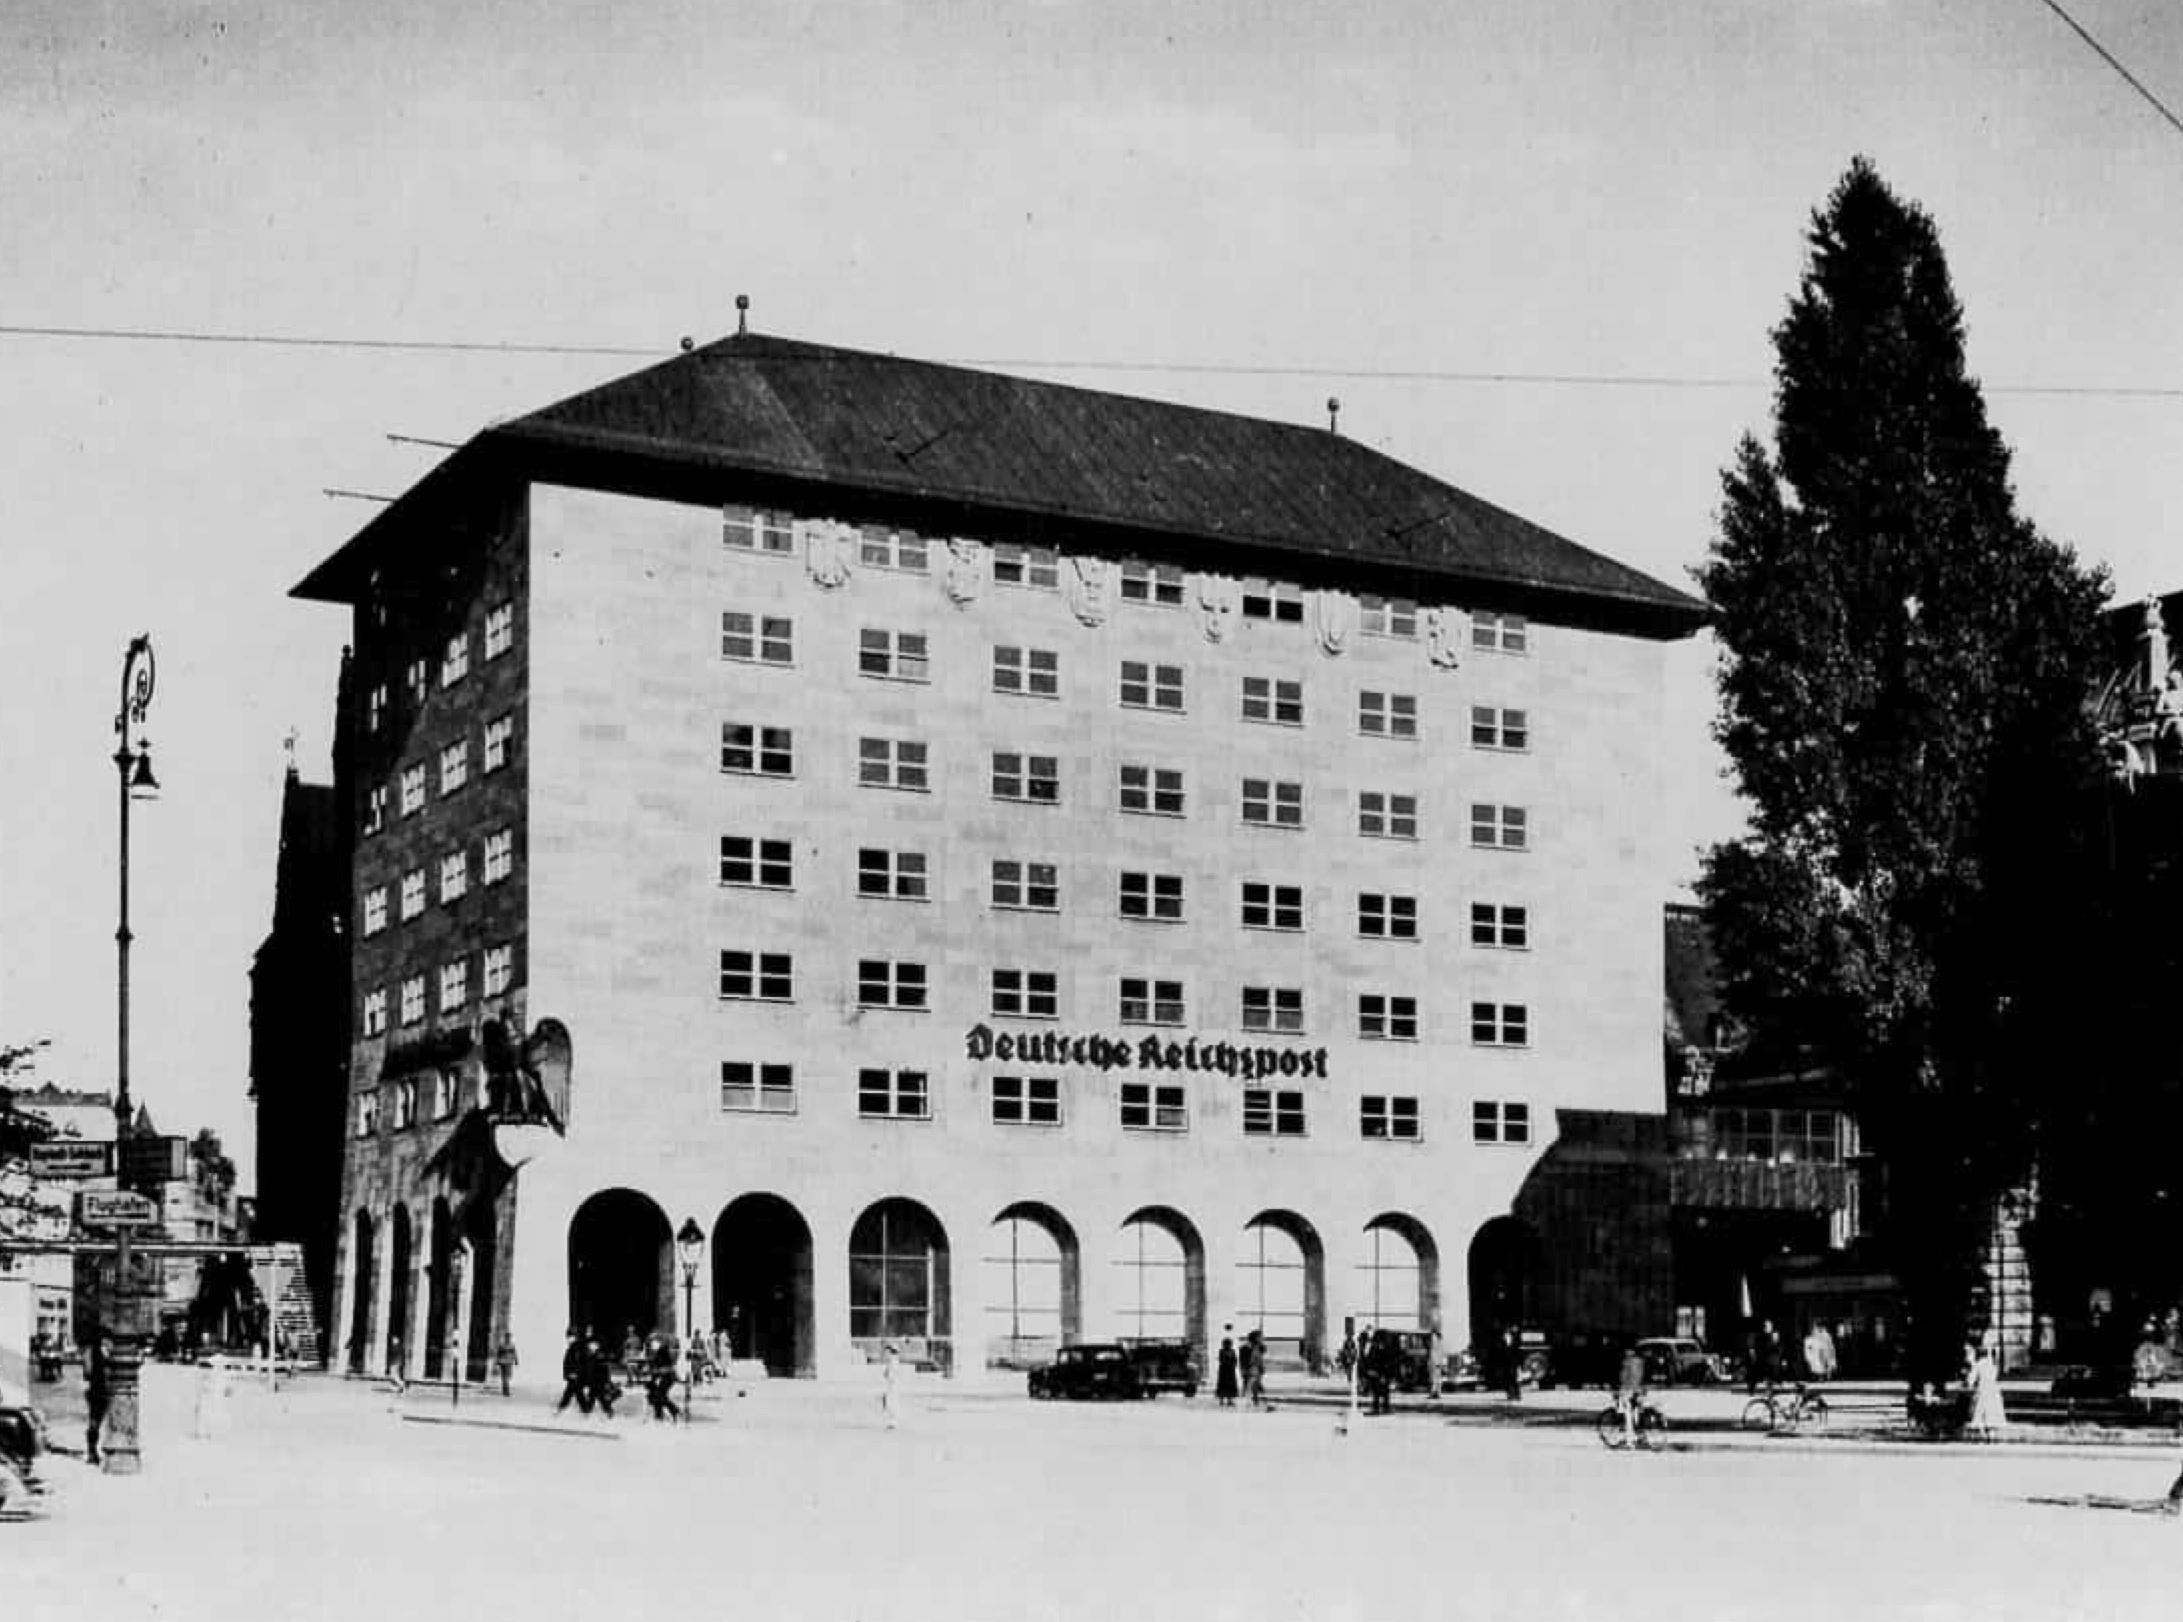 Baufirmen Nürnberg denkmale in gefahr seite 6 stadtbild initiative nürnberg